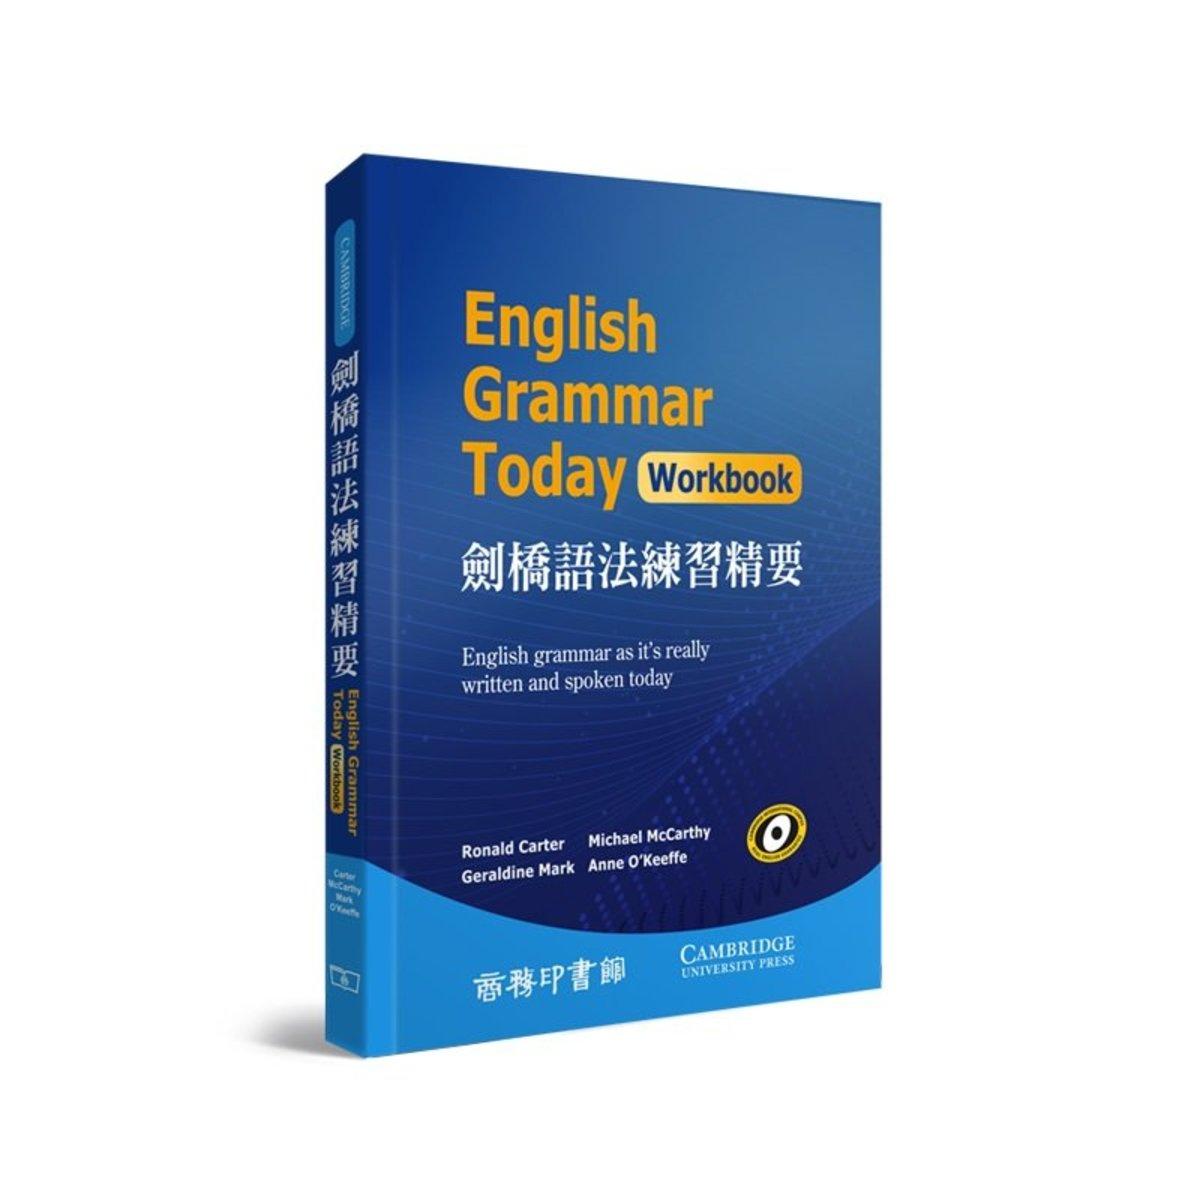 English Grammar Today Workbook 劍橋語法 練習精要